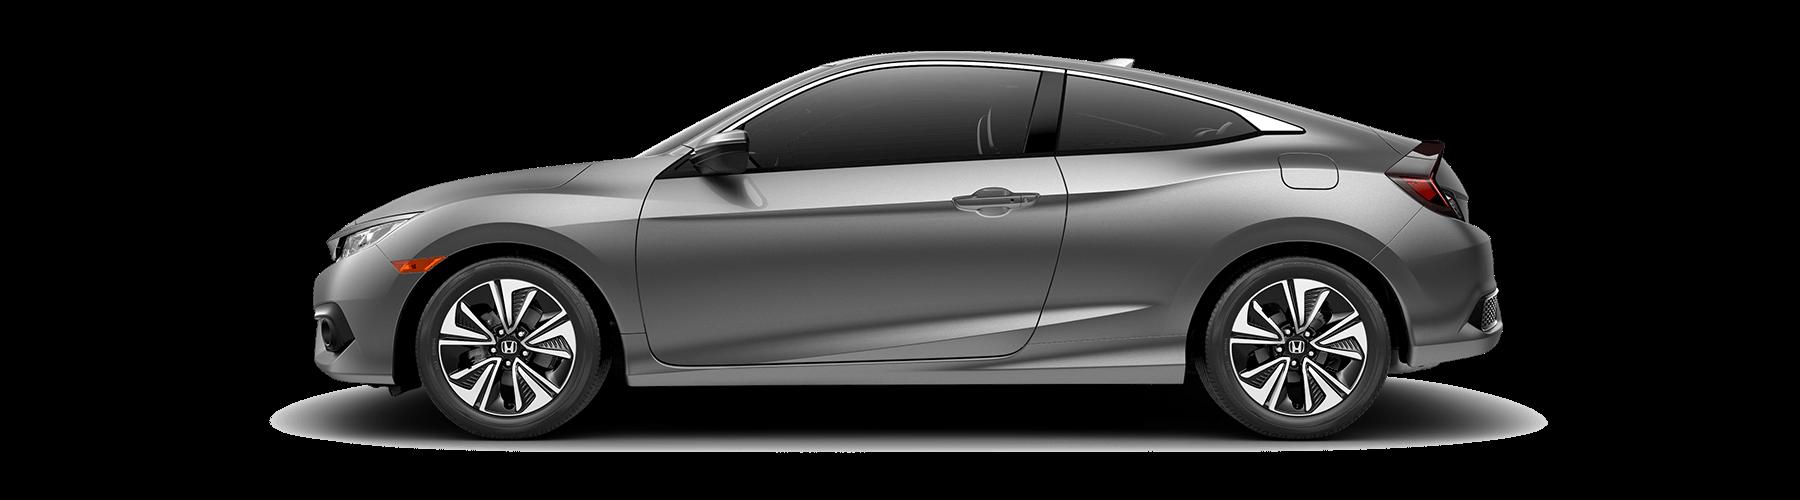 2017 Honda Civic Coupe Side Profile